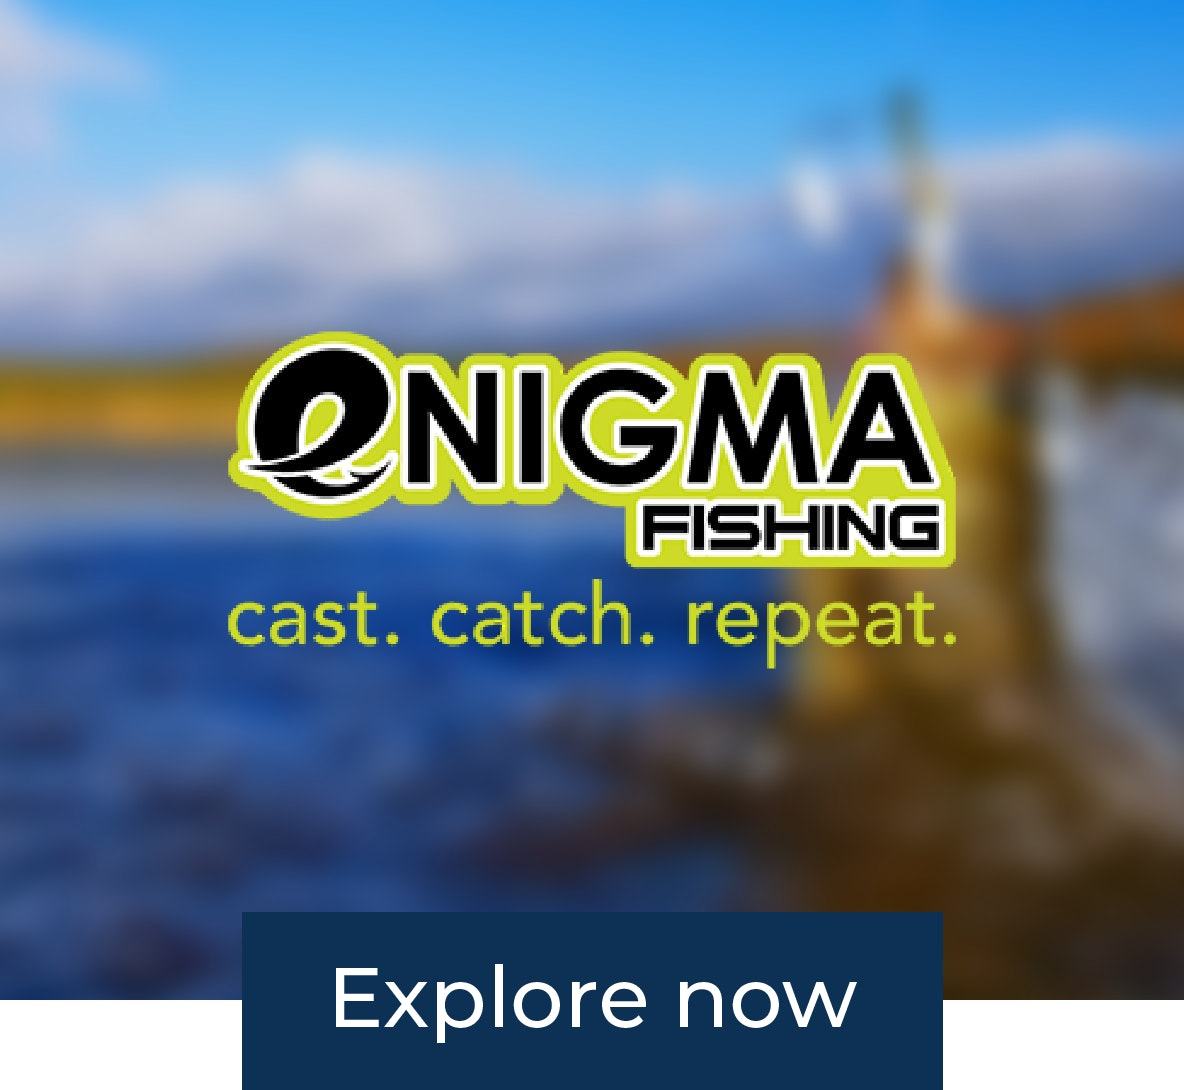 Enigma fishing